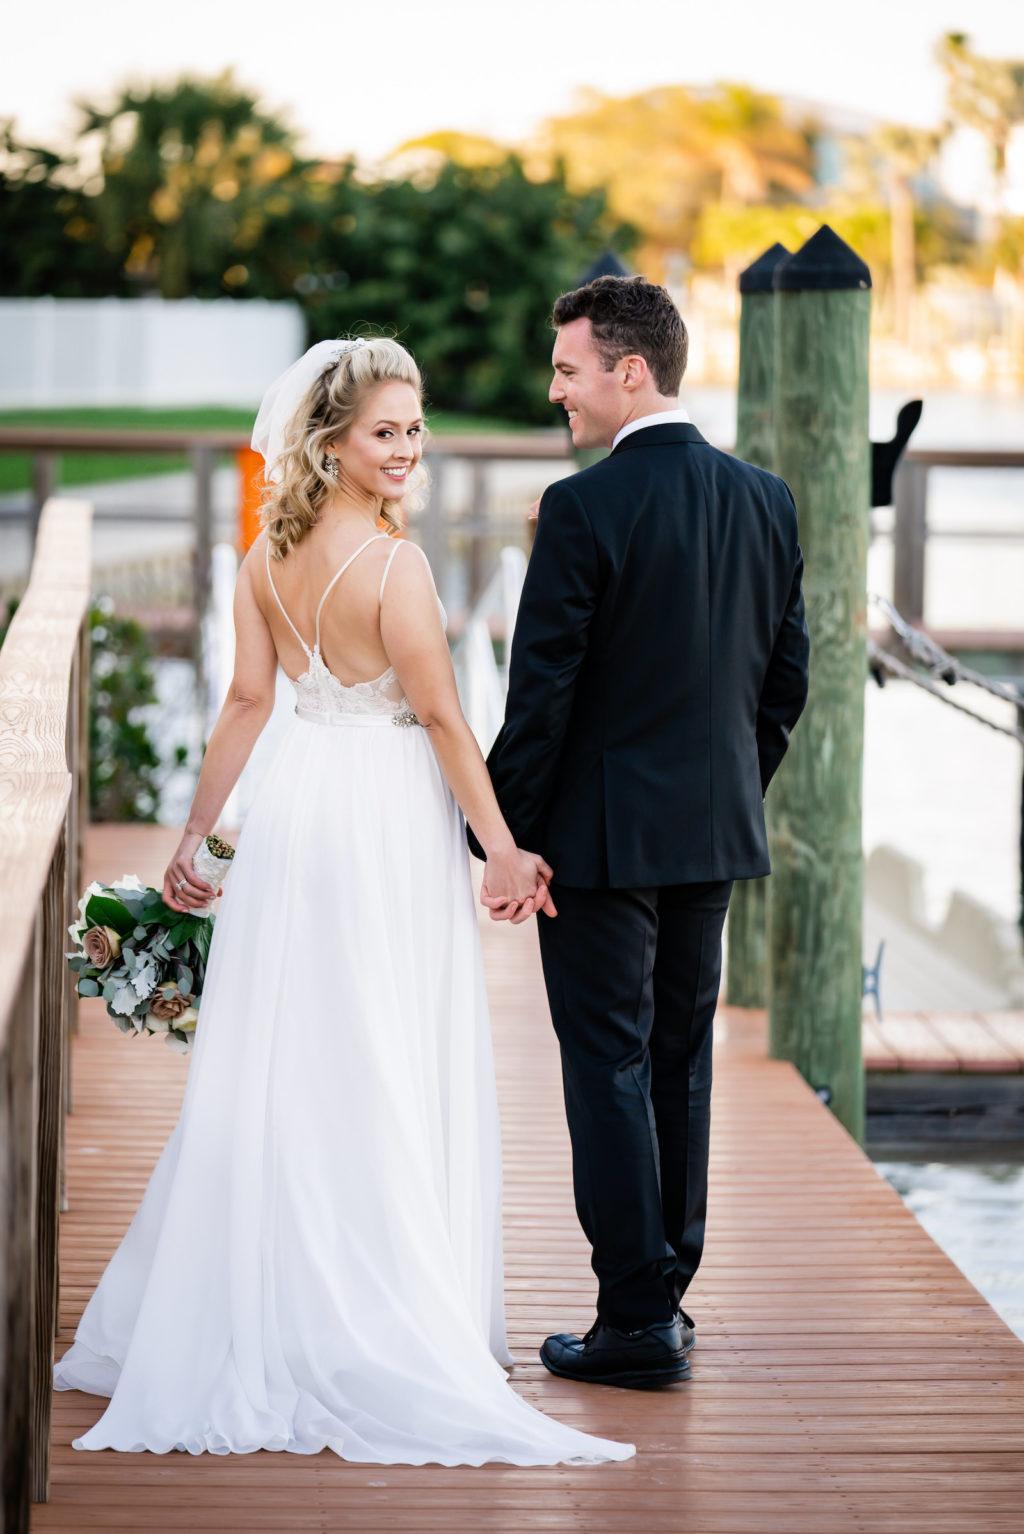 Florida Bride and Groom Holding Hands on Dock | St. Pete Wedding Venue Hotel Zamora | Tampa Wedding Dress Isabel O'Neil Bridal